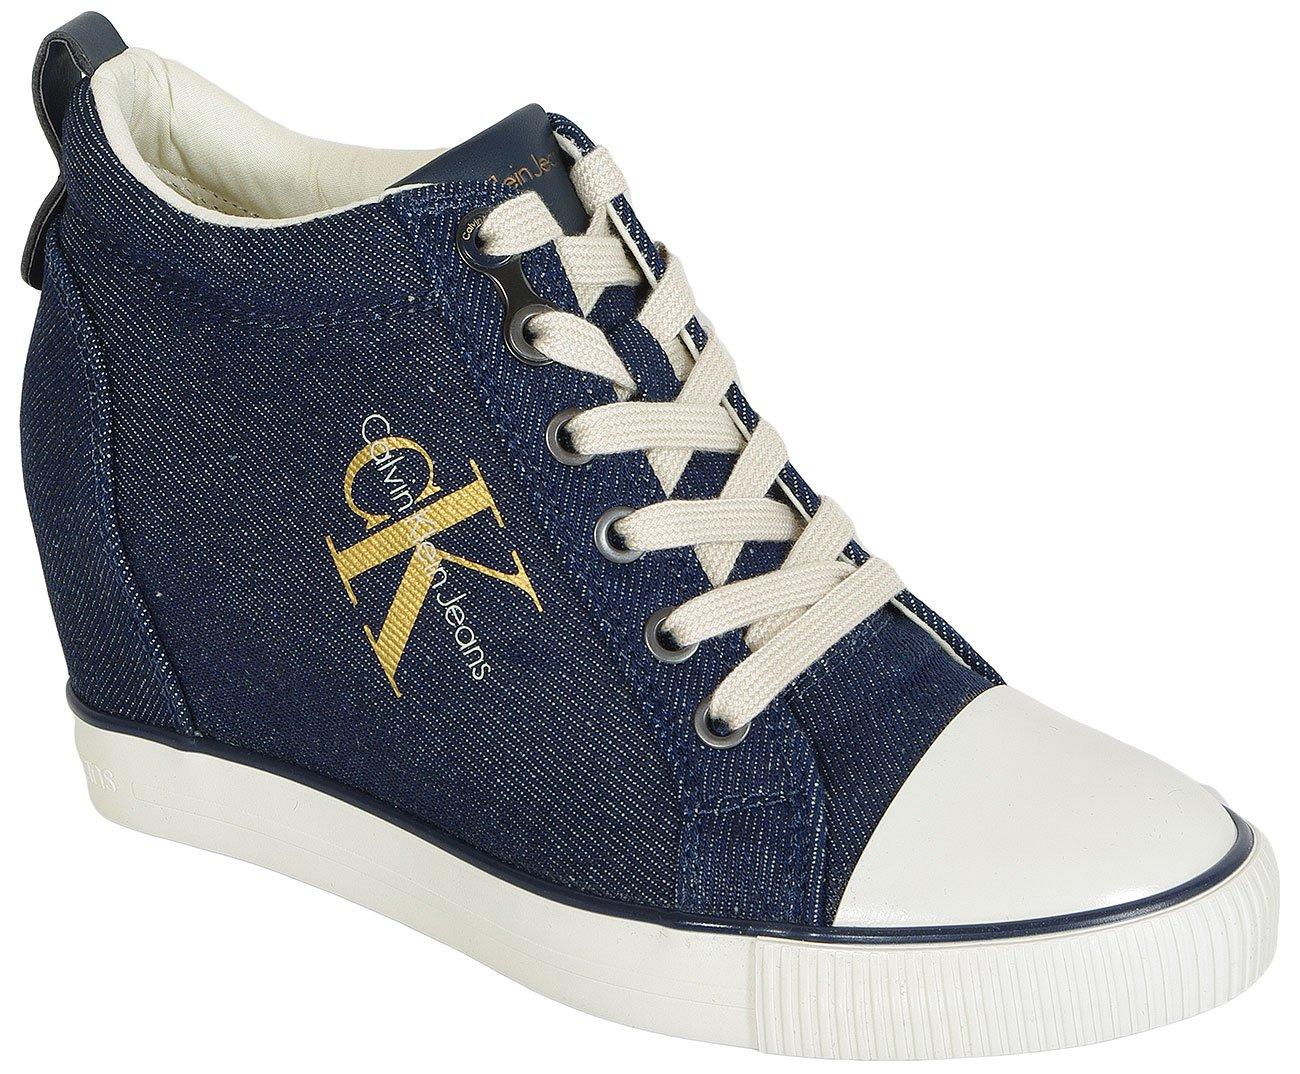 Calvin Klein Jeans Reina Metal Denim sneakers